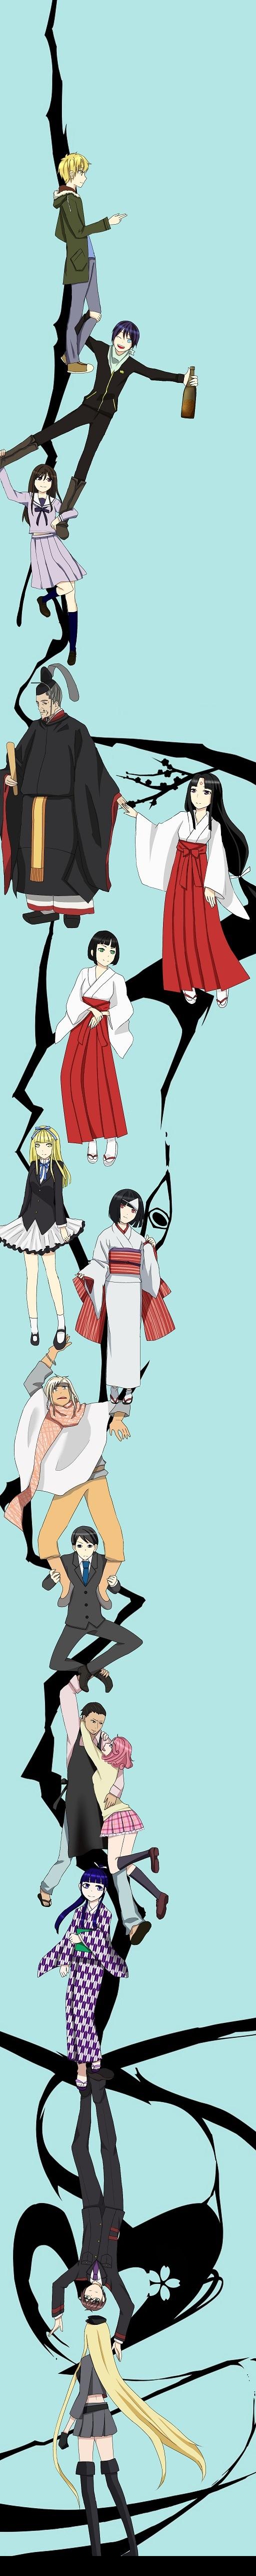 Tags: Anime, Pixiv Id 2601605, Noragami, Yukine (Noragami), Mayu (Noragami), Kazuma (Noragami), Yato (Noragami), Kugaha (Noragami), Bishamonten (Noragami), Tenjin (Noragami), Nora (Noragami), Daikoku (Noragami), Iki Hiyori